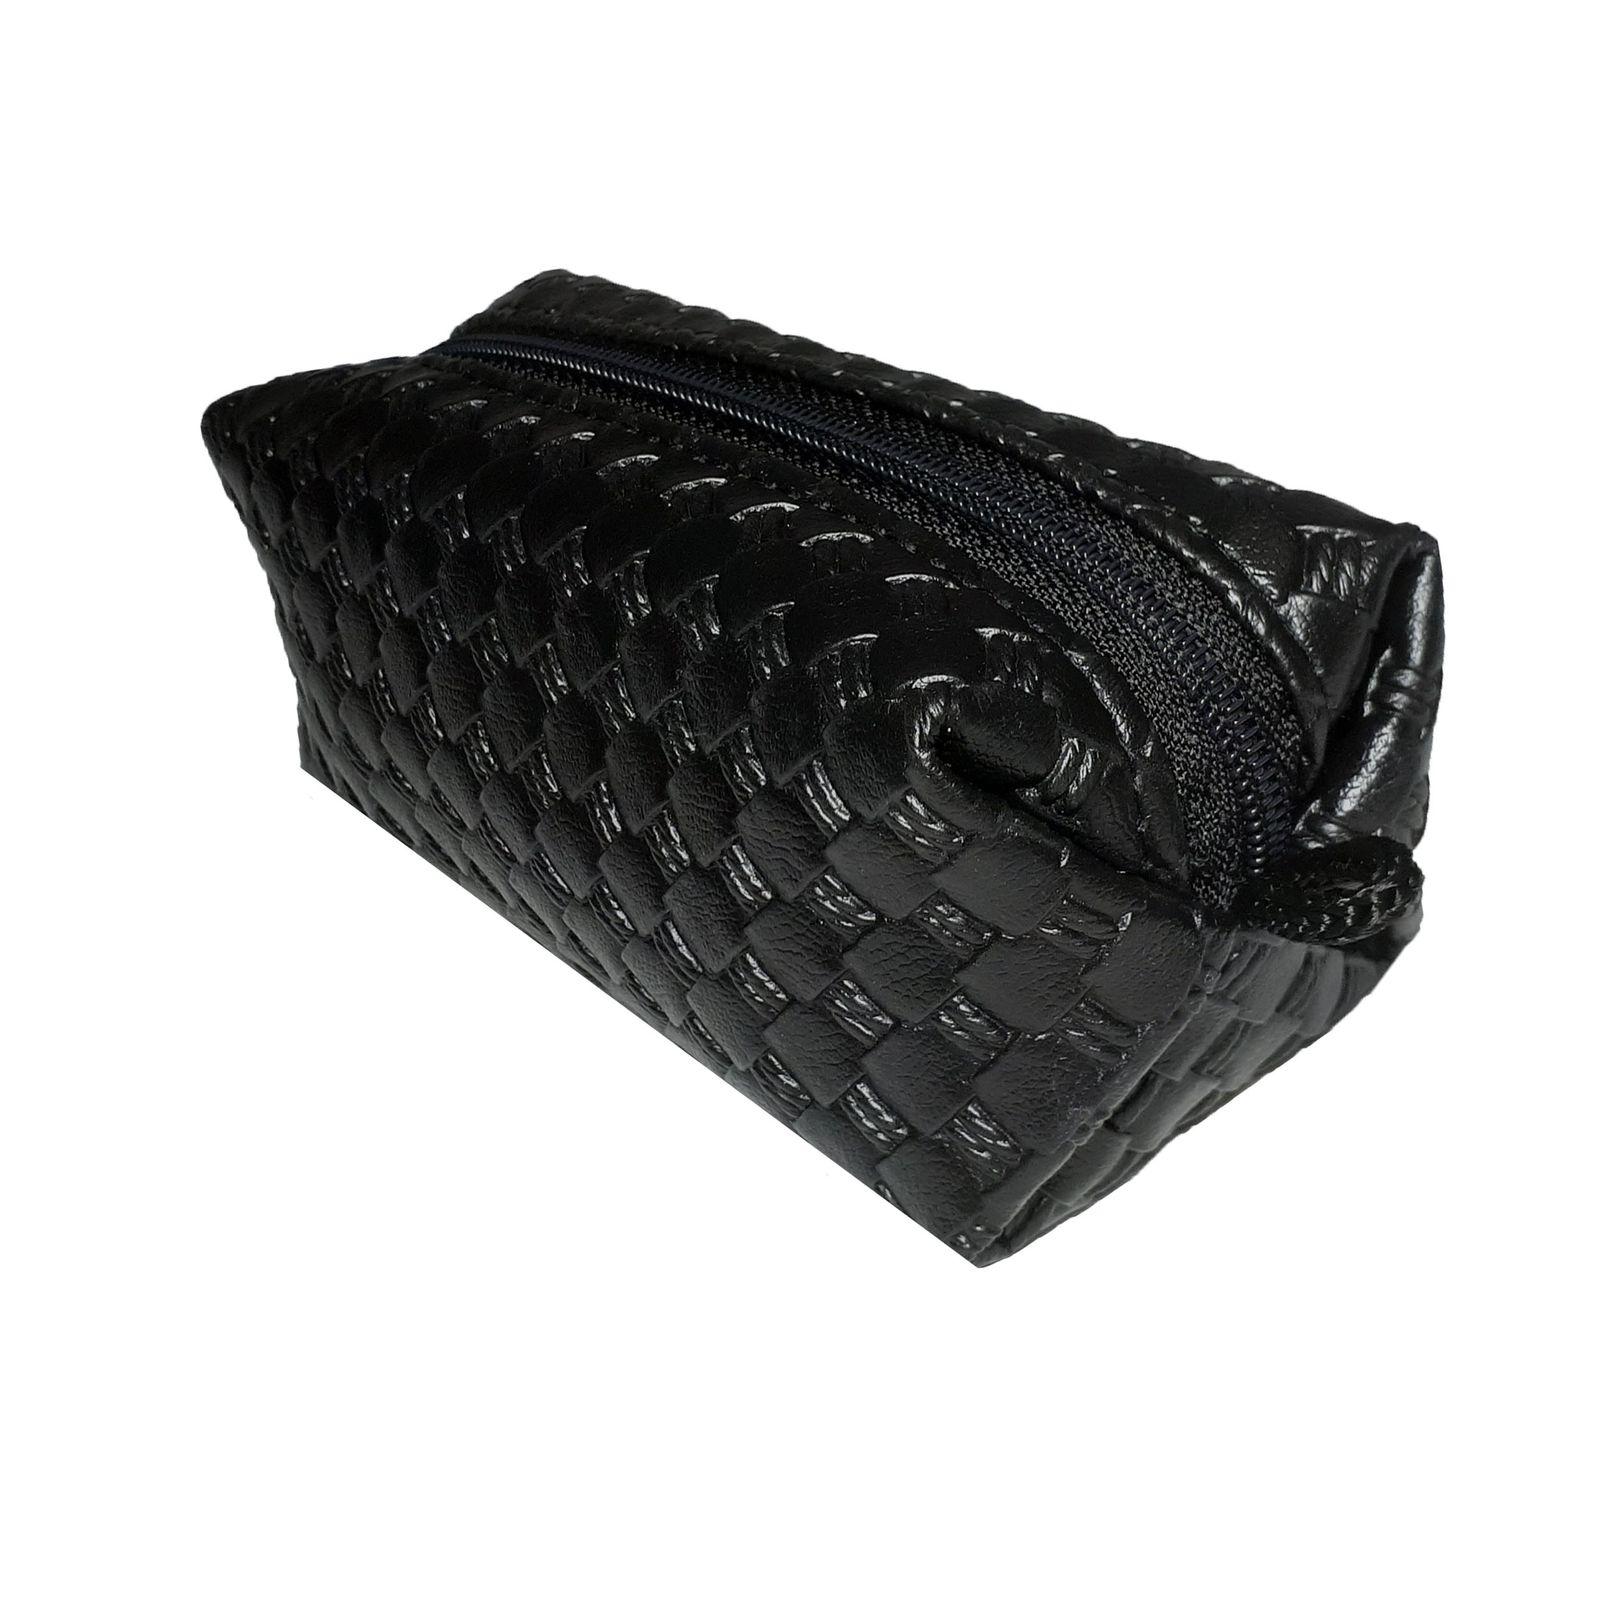 کیف لوازم آرایش زنانه کد GT0105 -  - 5